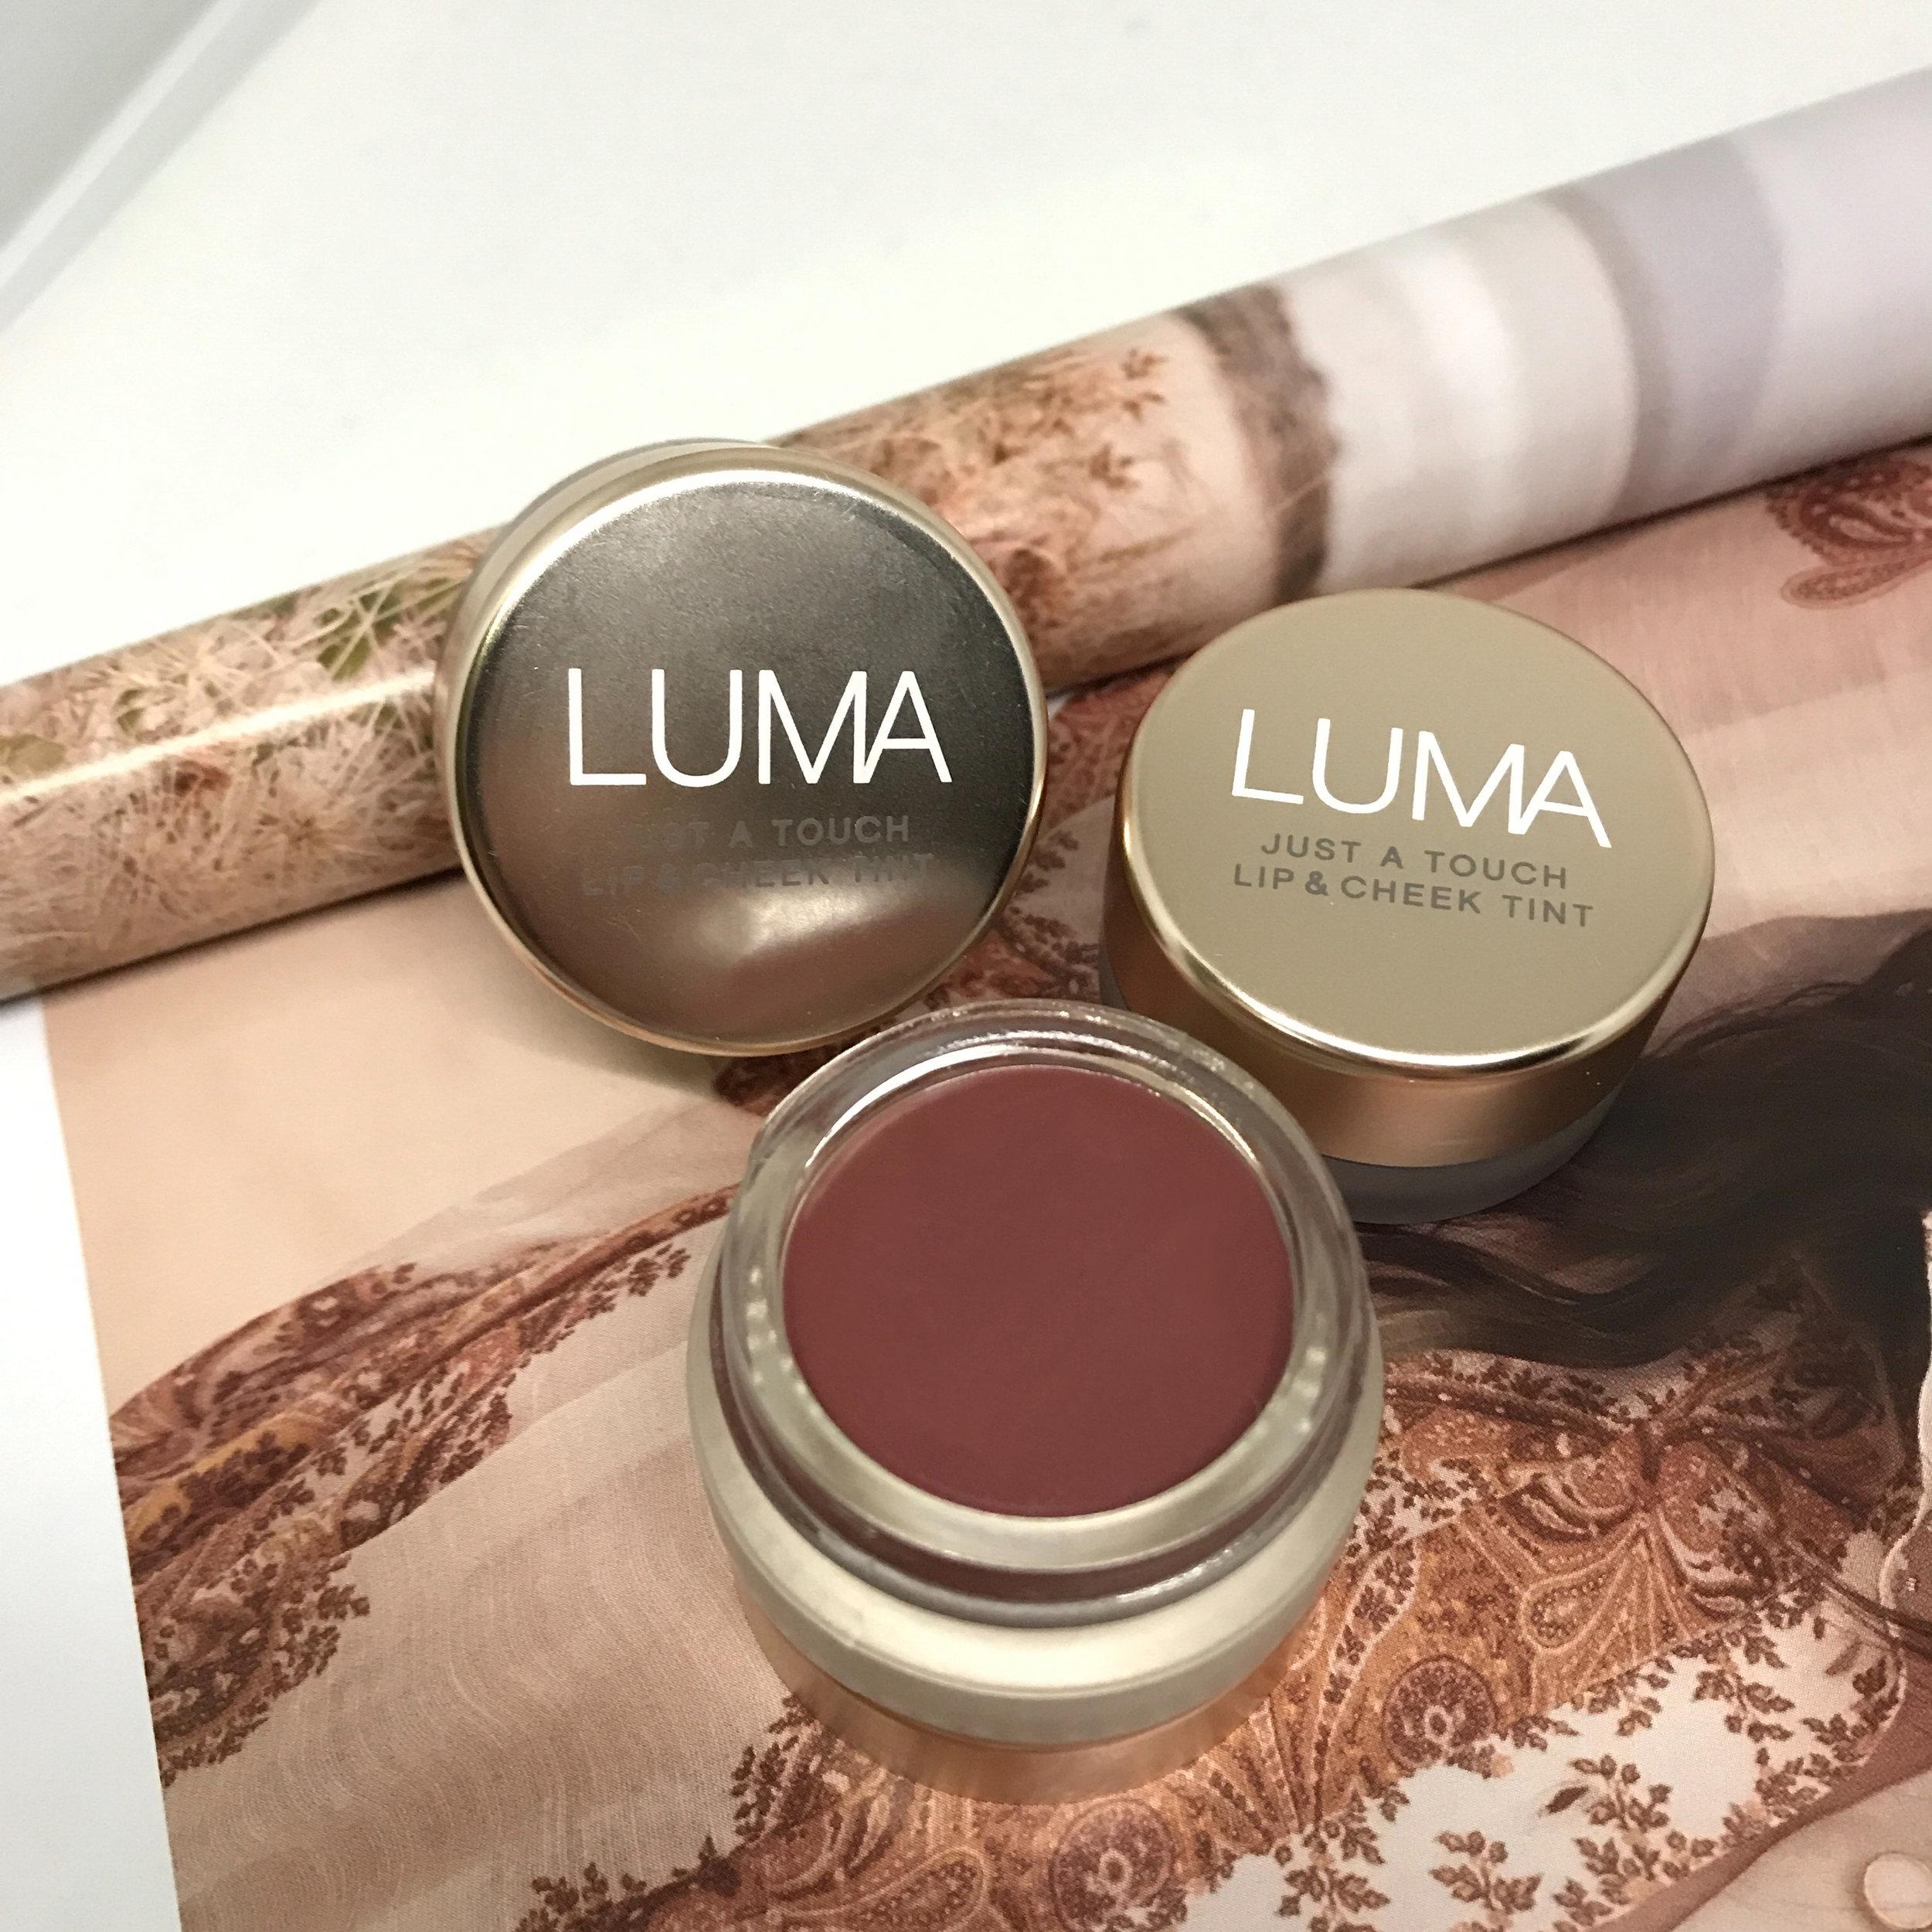 luma lady luck lip and cheek.jpg